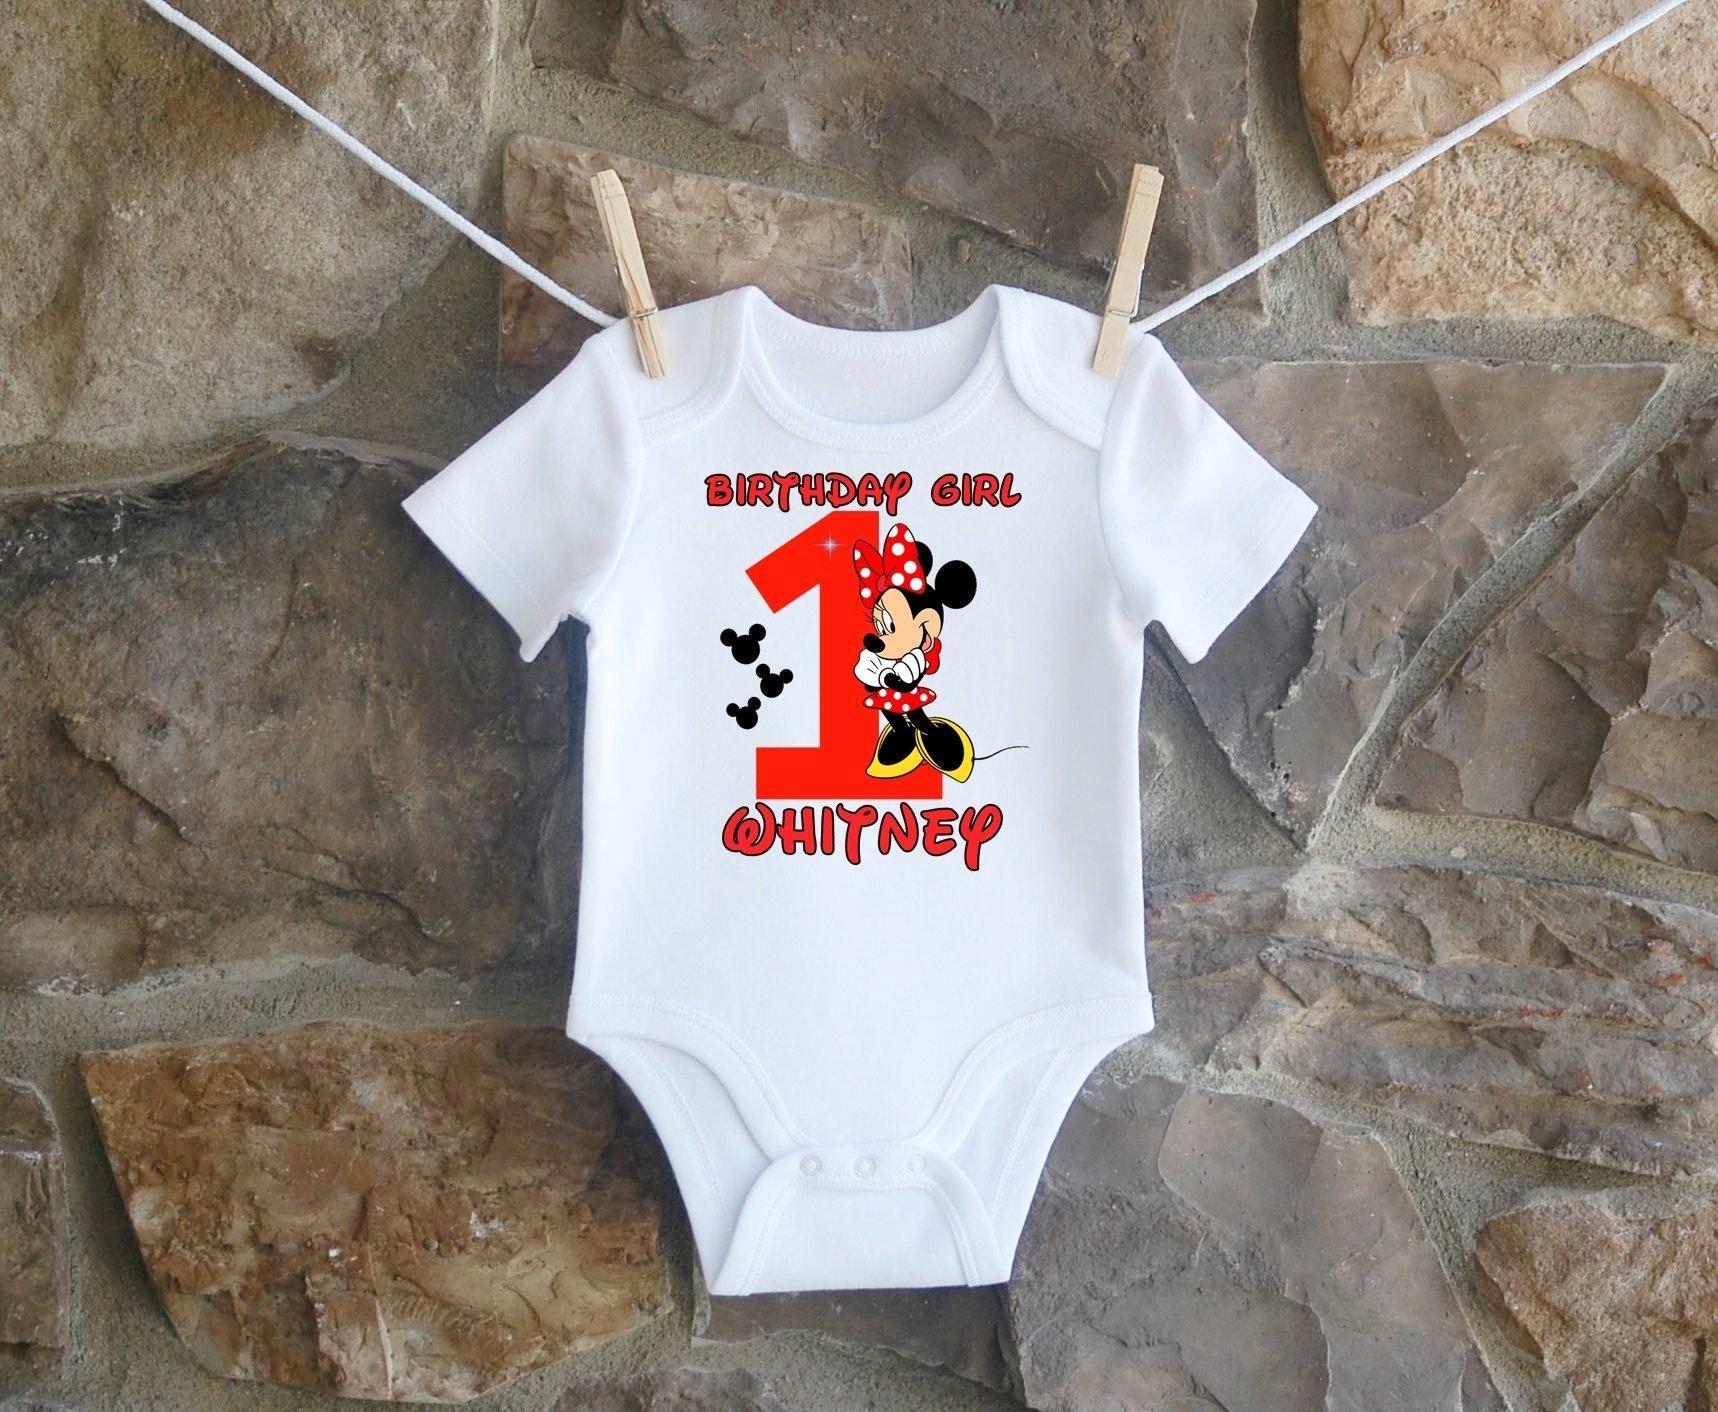 Minnie Mouse Birthday Shirt, Minnie Mouse Birthday Shirt For Girls, Personalized Girls Red Black Minnie Mouse Birthday Shirt, Customized Minnie Mouse Birthday Shirt